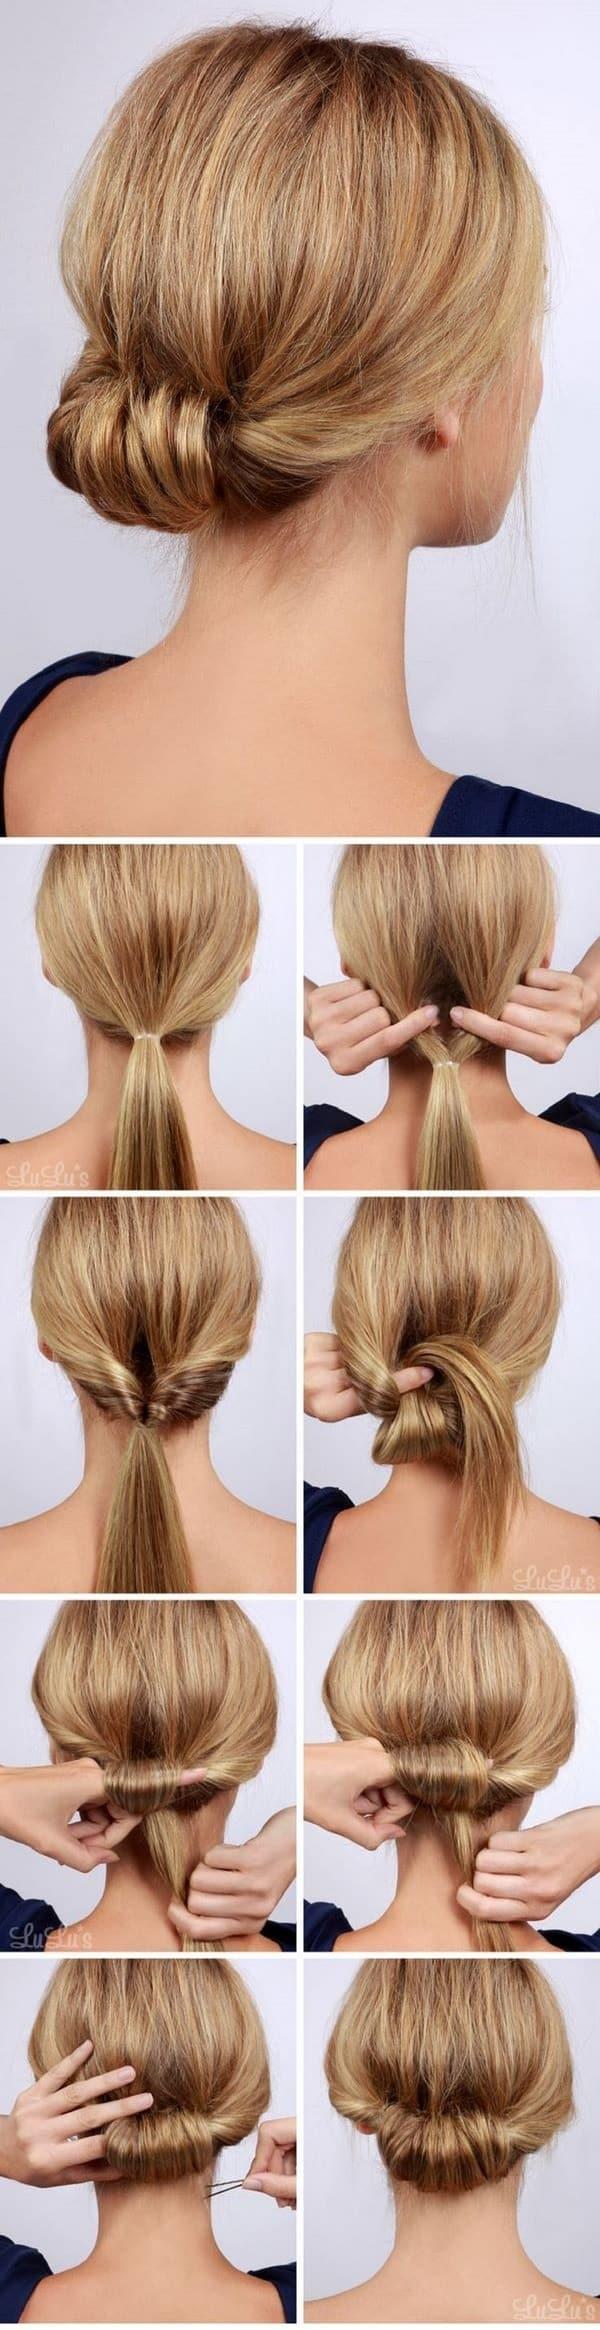 Como hacer peinados recogidos en cabello corto